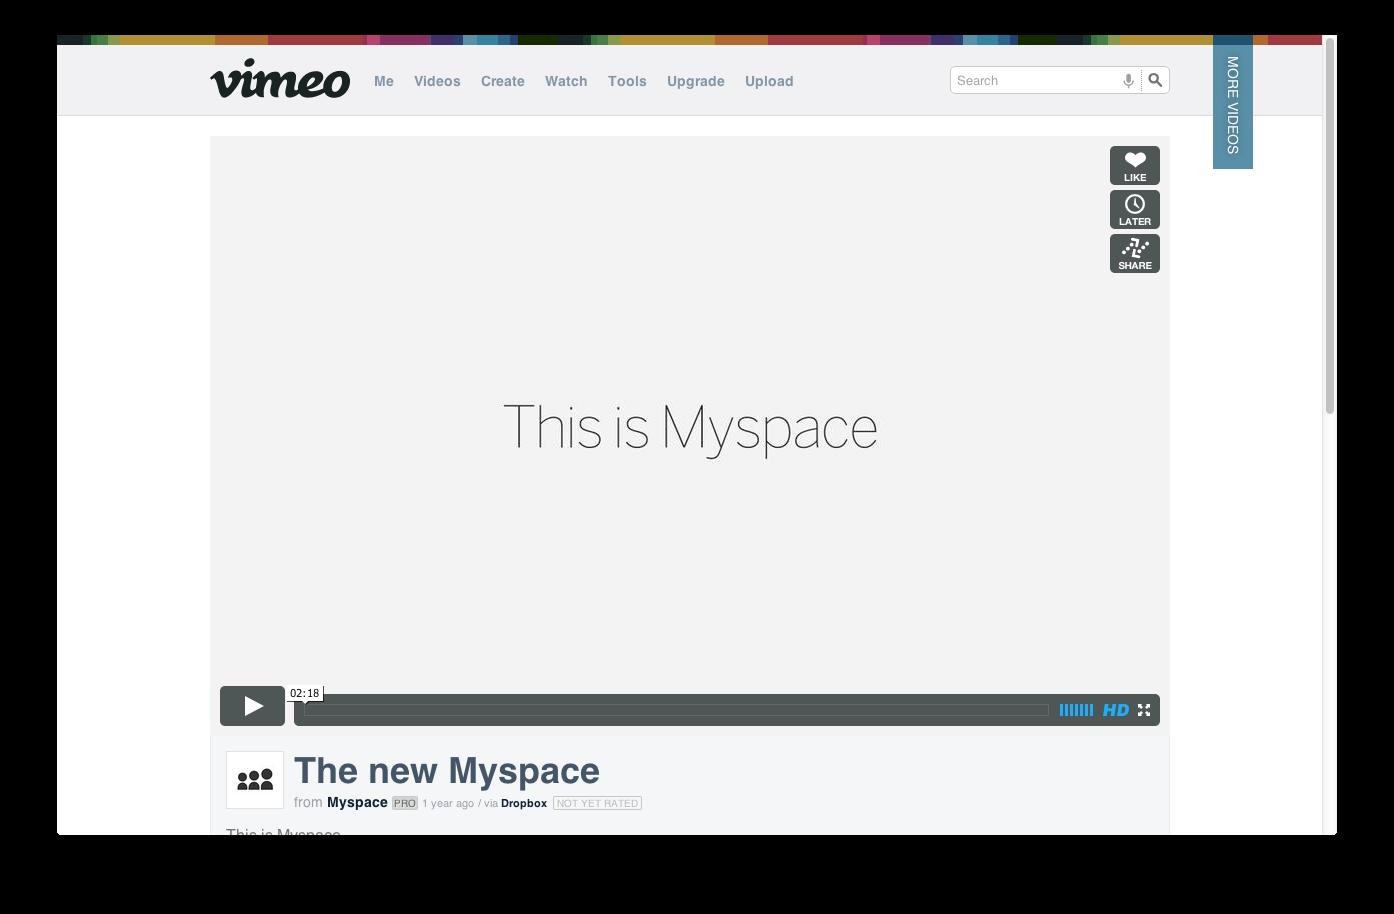 The new Myspace